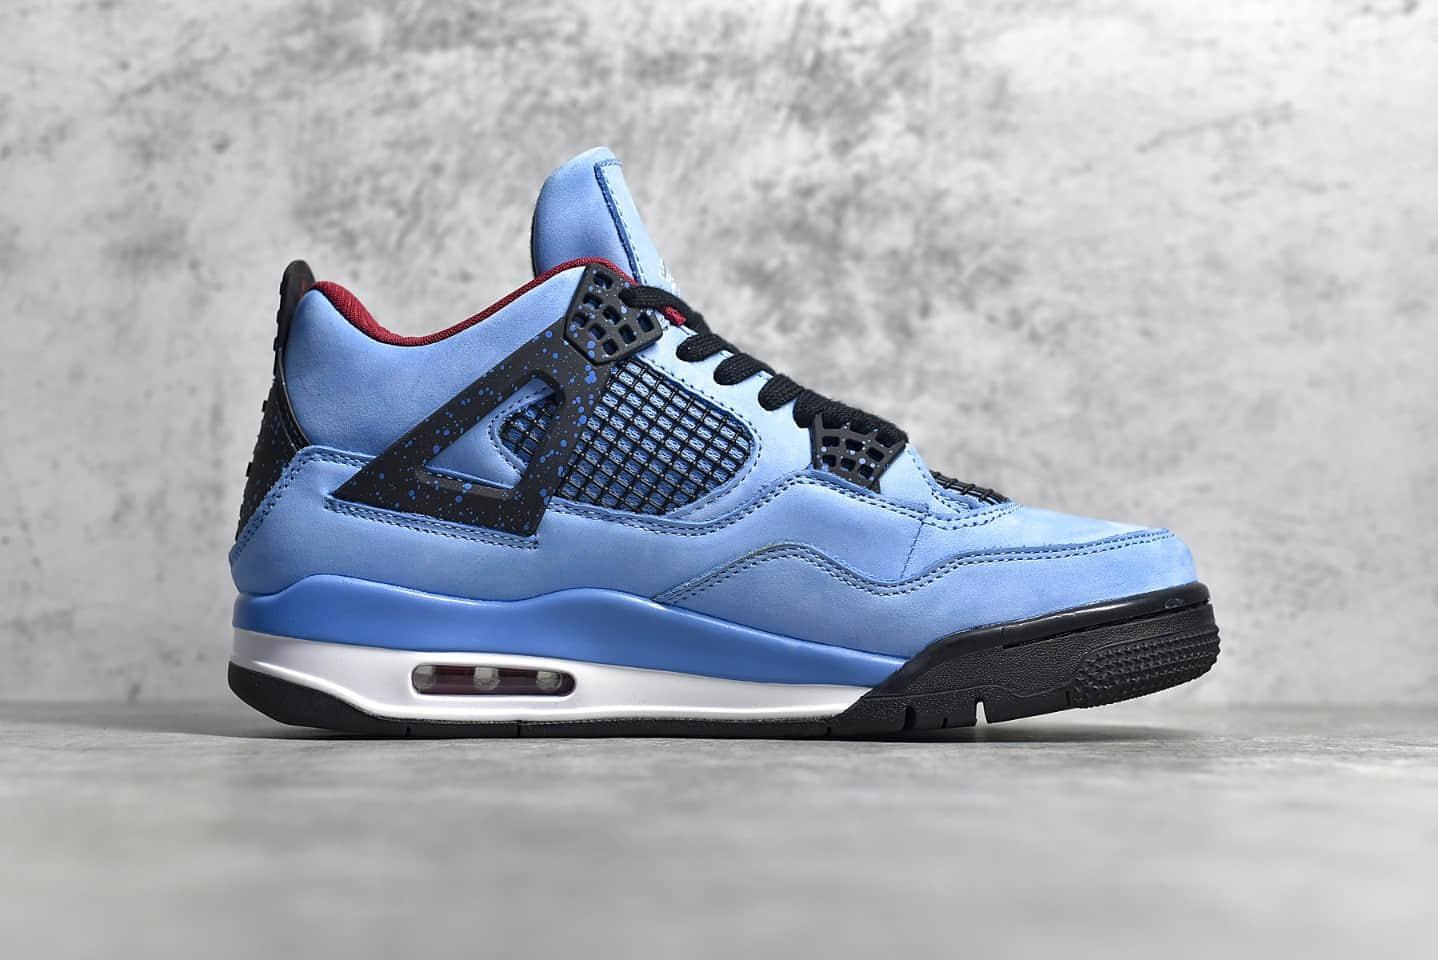 AJ4TS联名蓝色麂皮 Travis Scott x Air Jordan 4 Retro 斯科特AJ4联名蓝黑球鞋 货号:308497-406-潮流者之家